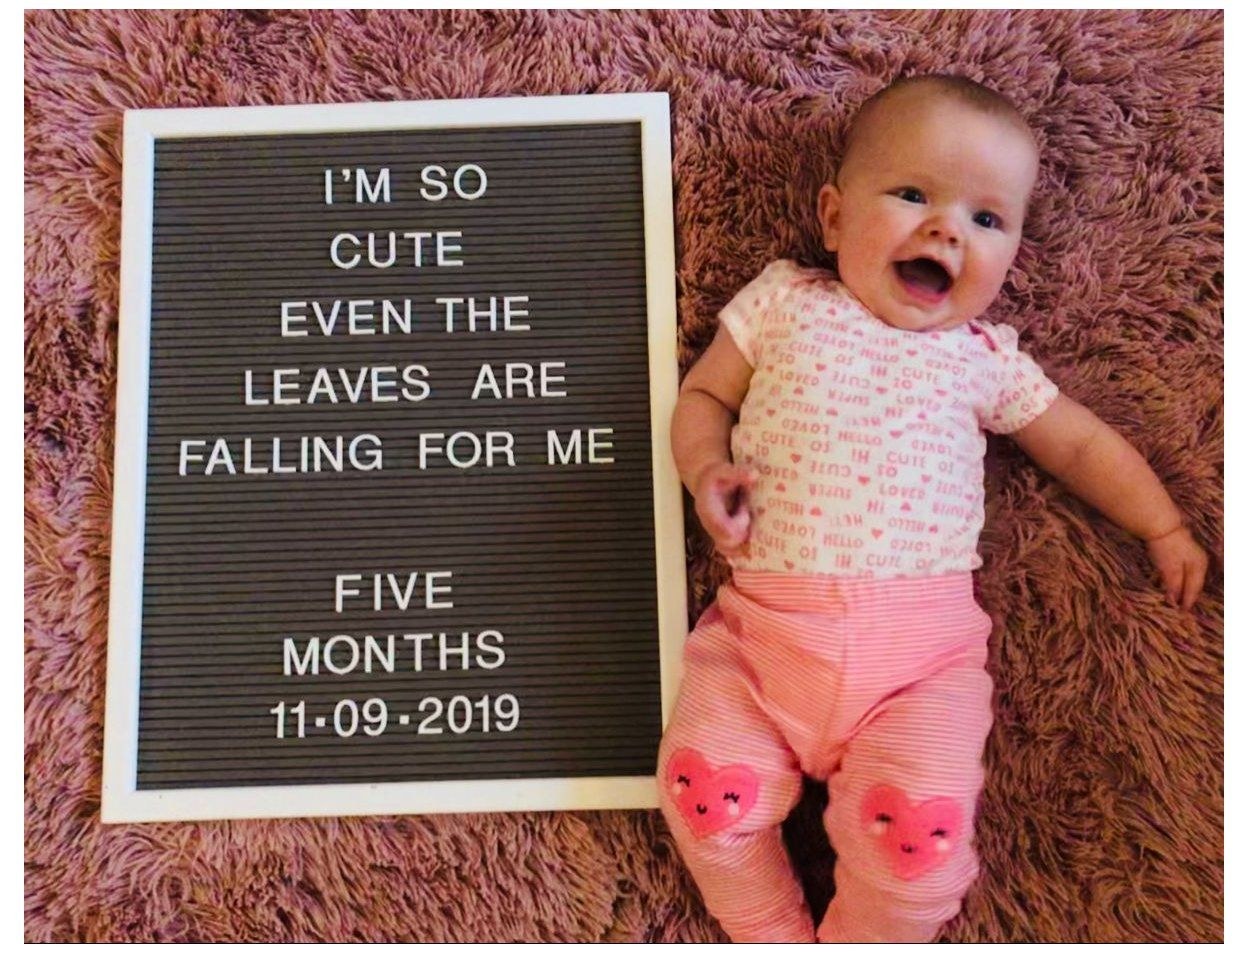 Baby Letter Board Baby Milestone Photos Boys Babymilestonephotosboys In 2021 Baby Milestone Photos Baby Milestones Pictures Monthly Baby Pictures